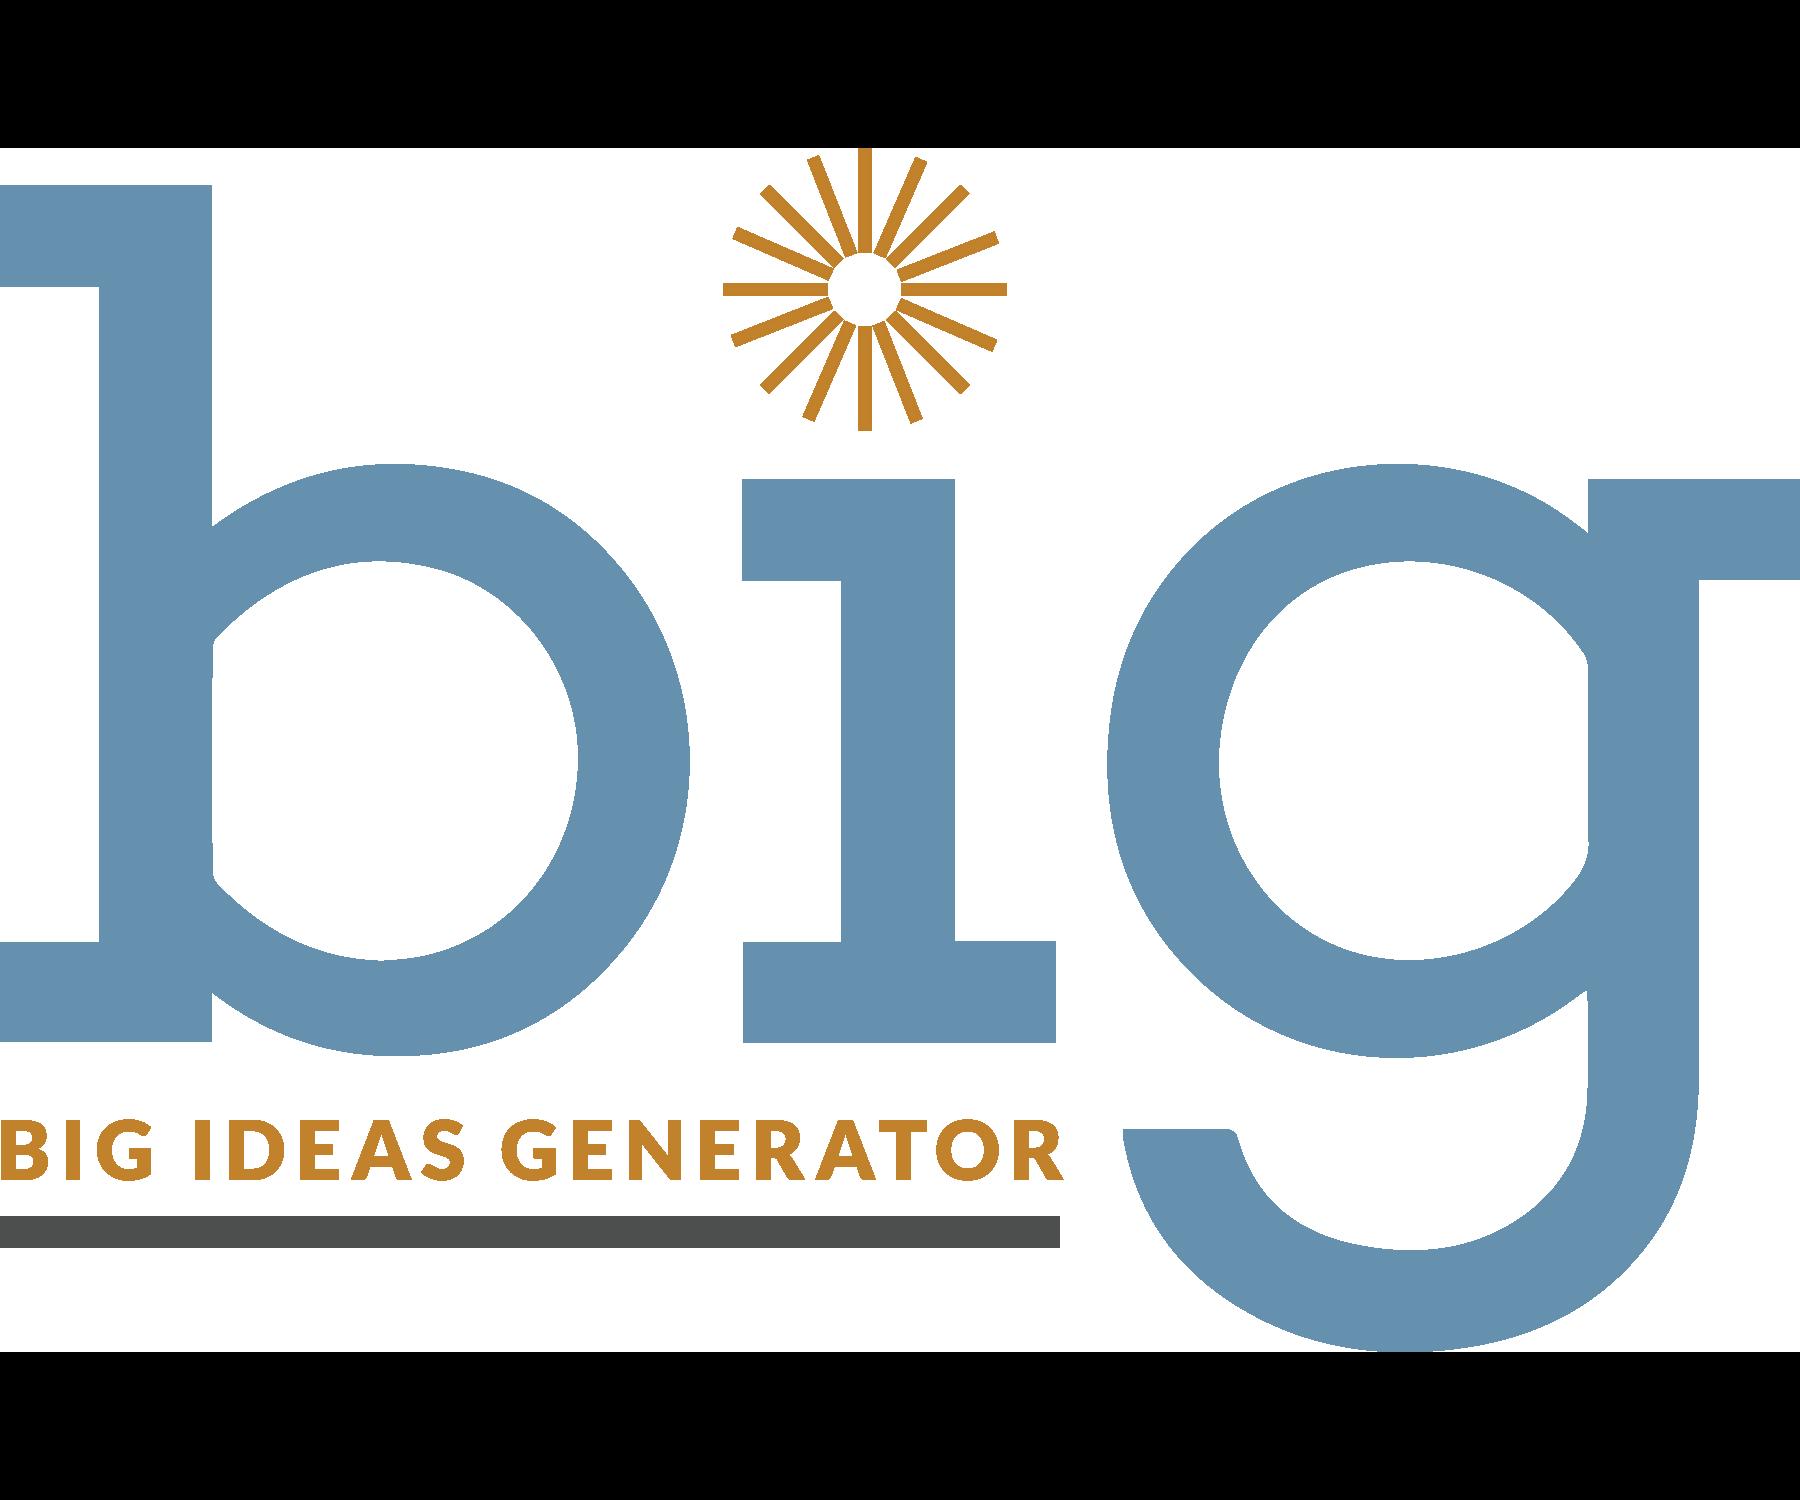 Big ideas Generator UChicago